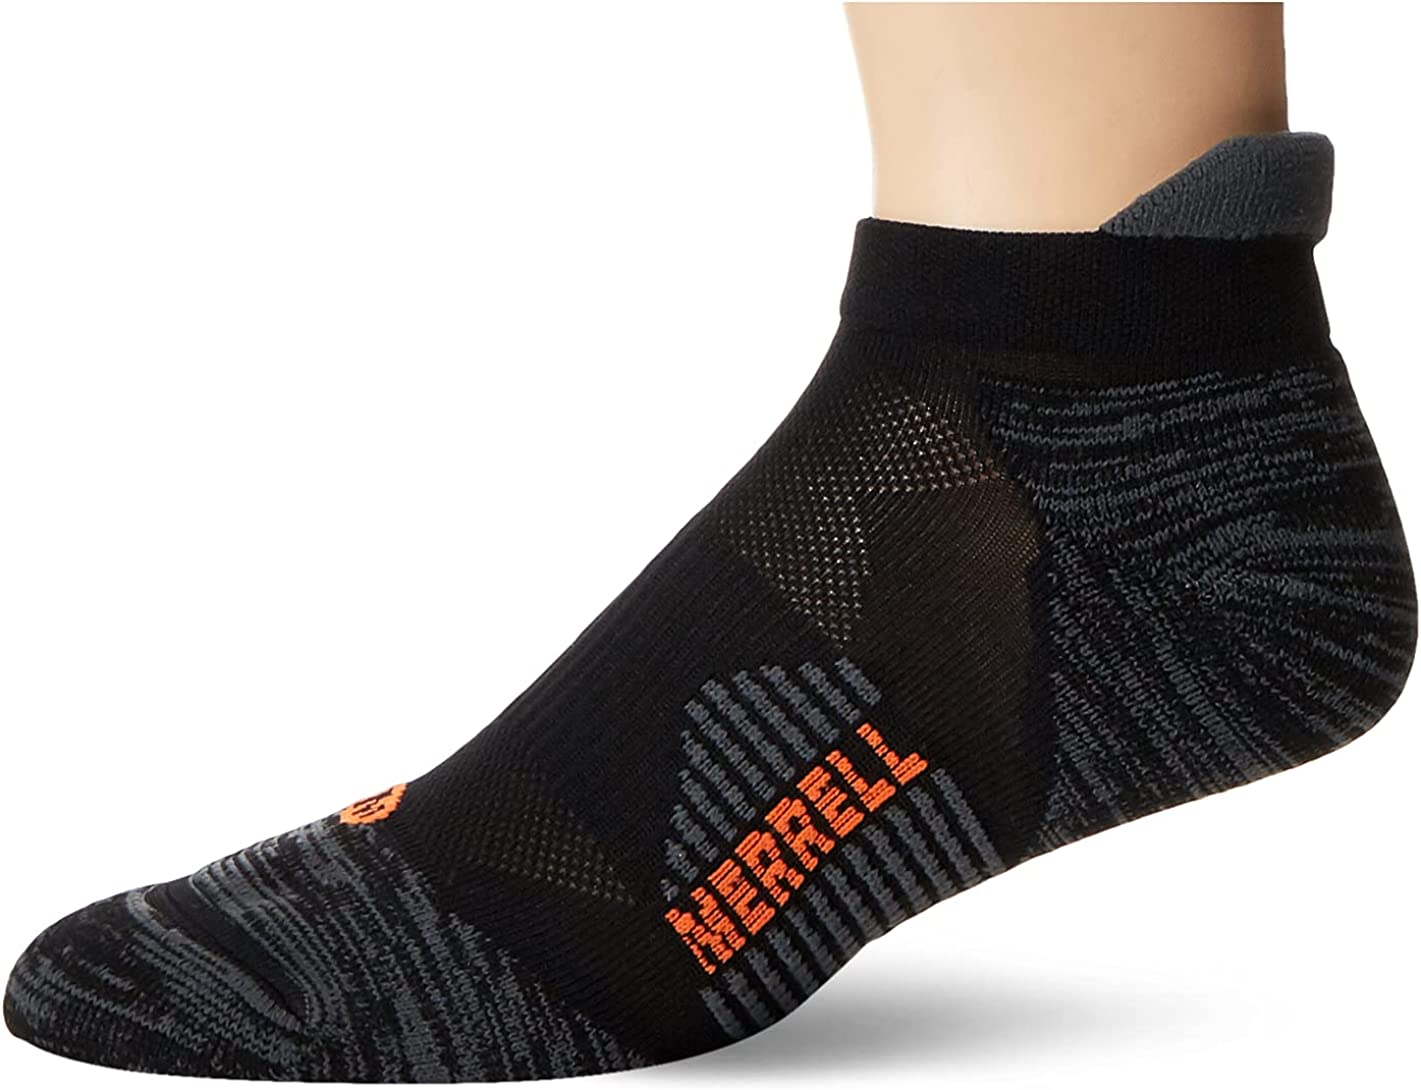 Merrell mens Ultra Light Socks